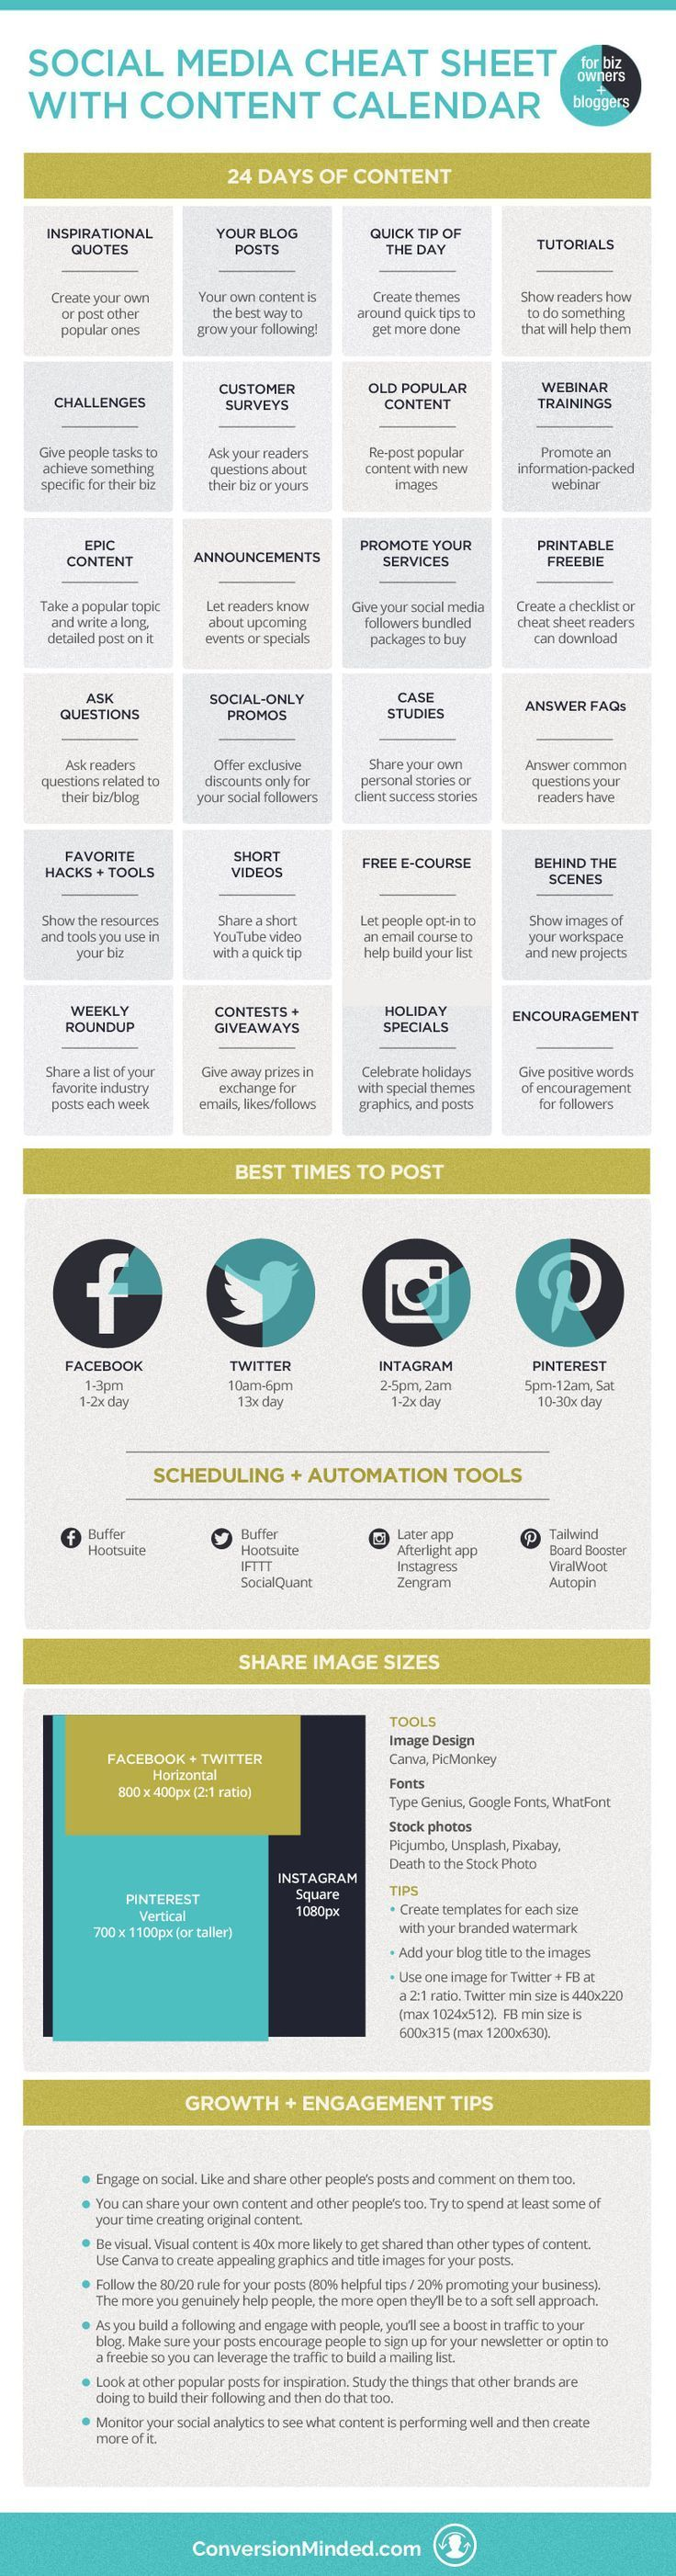 Social Media Cheat Sheet + Content Calendar